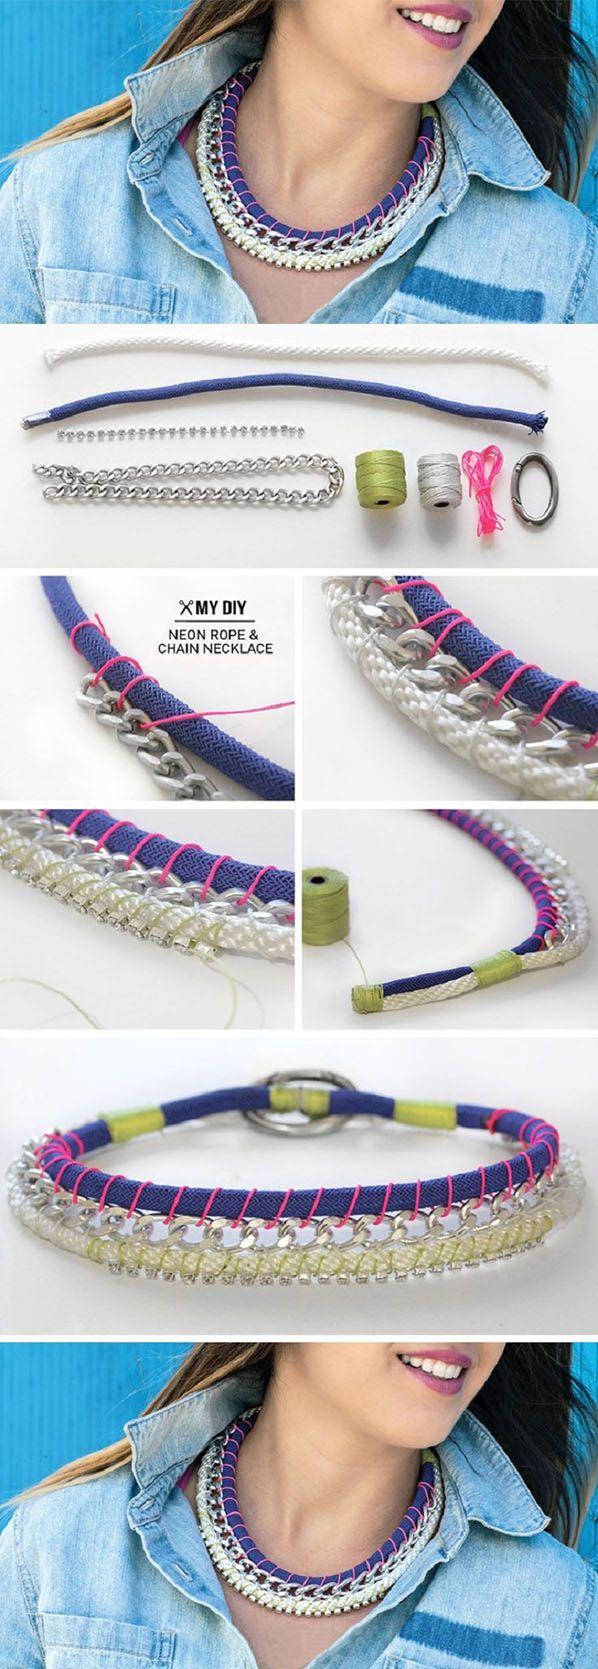 Do It Yourself Jewelry: DIY Beautiful Necklace Necklace Diy Diy Ideas Diy Crafts